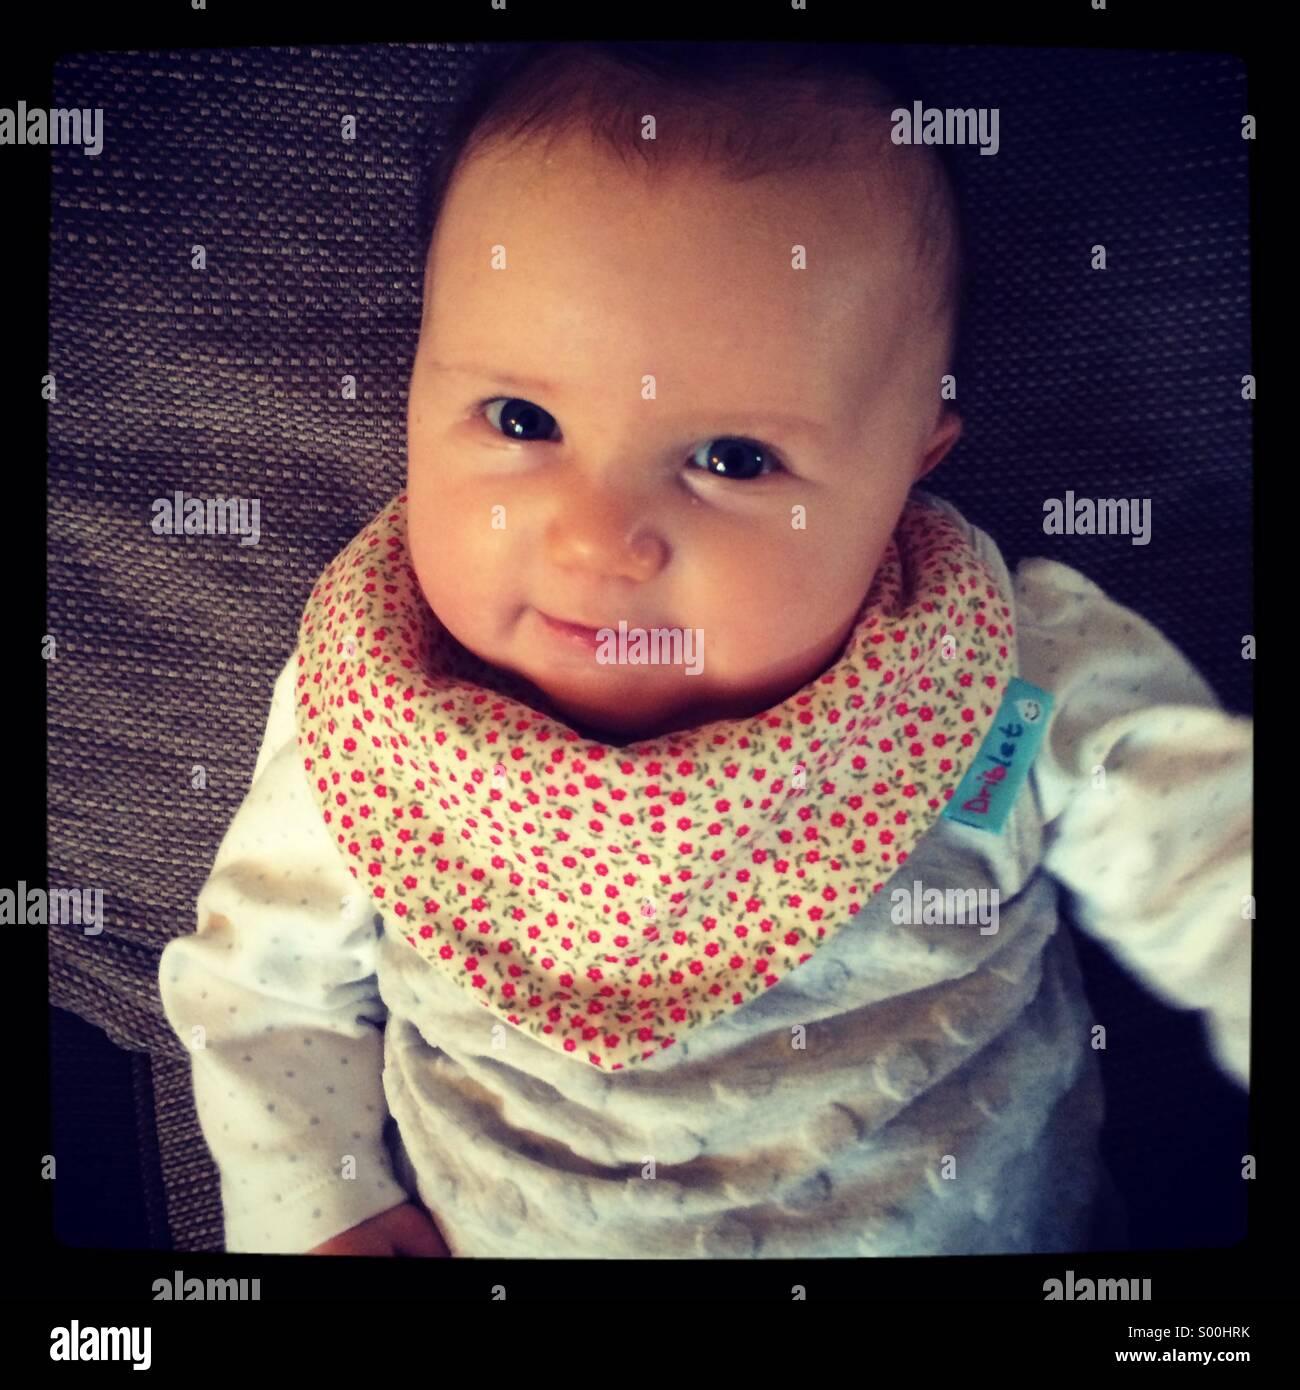 Baby girl aged 12 weeks - Stock Image